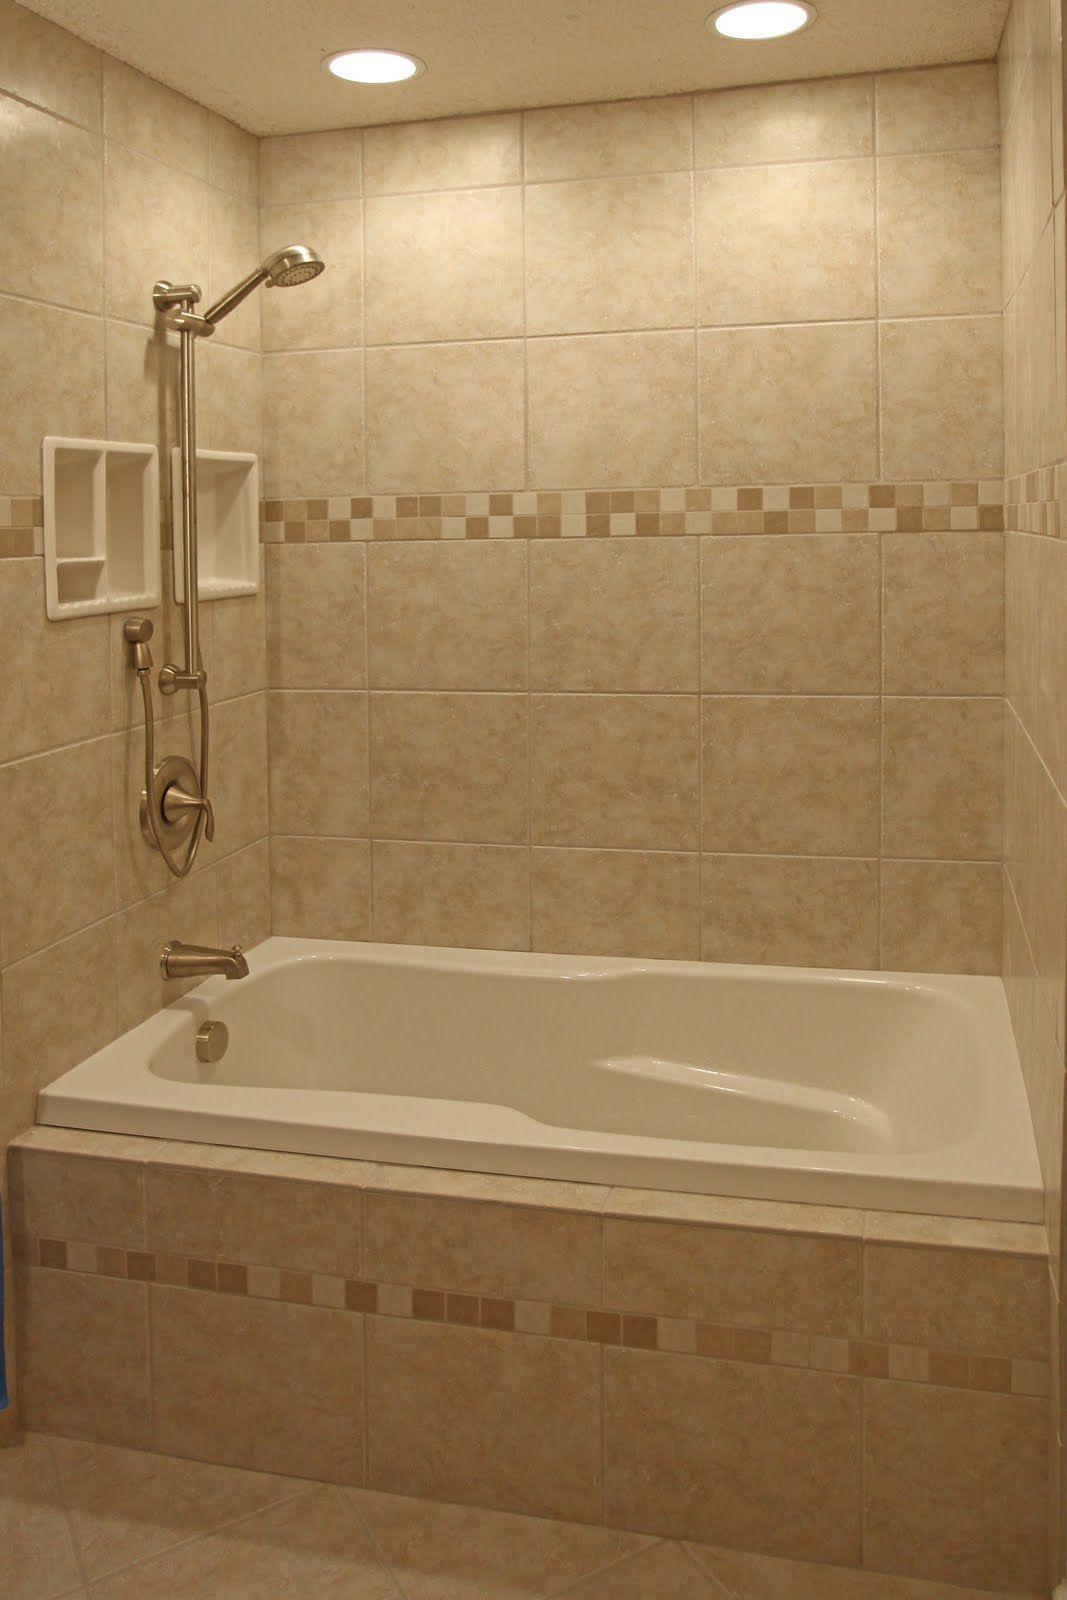 30 Small Bathroom Decorating Ideas With Images Bathroom Tub